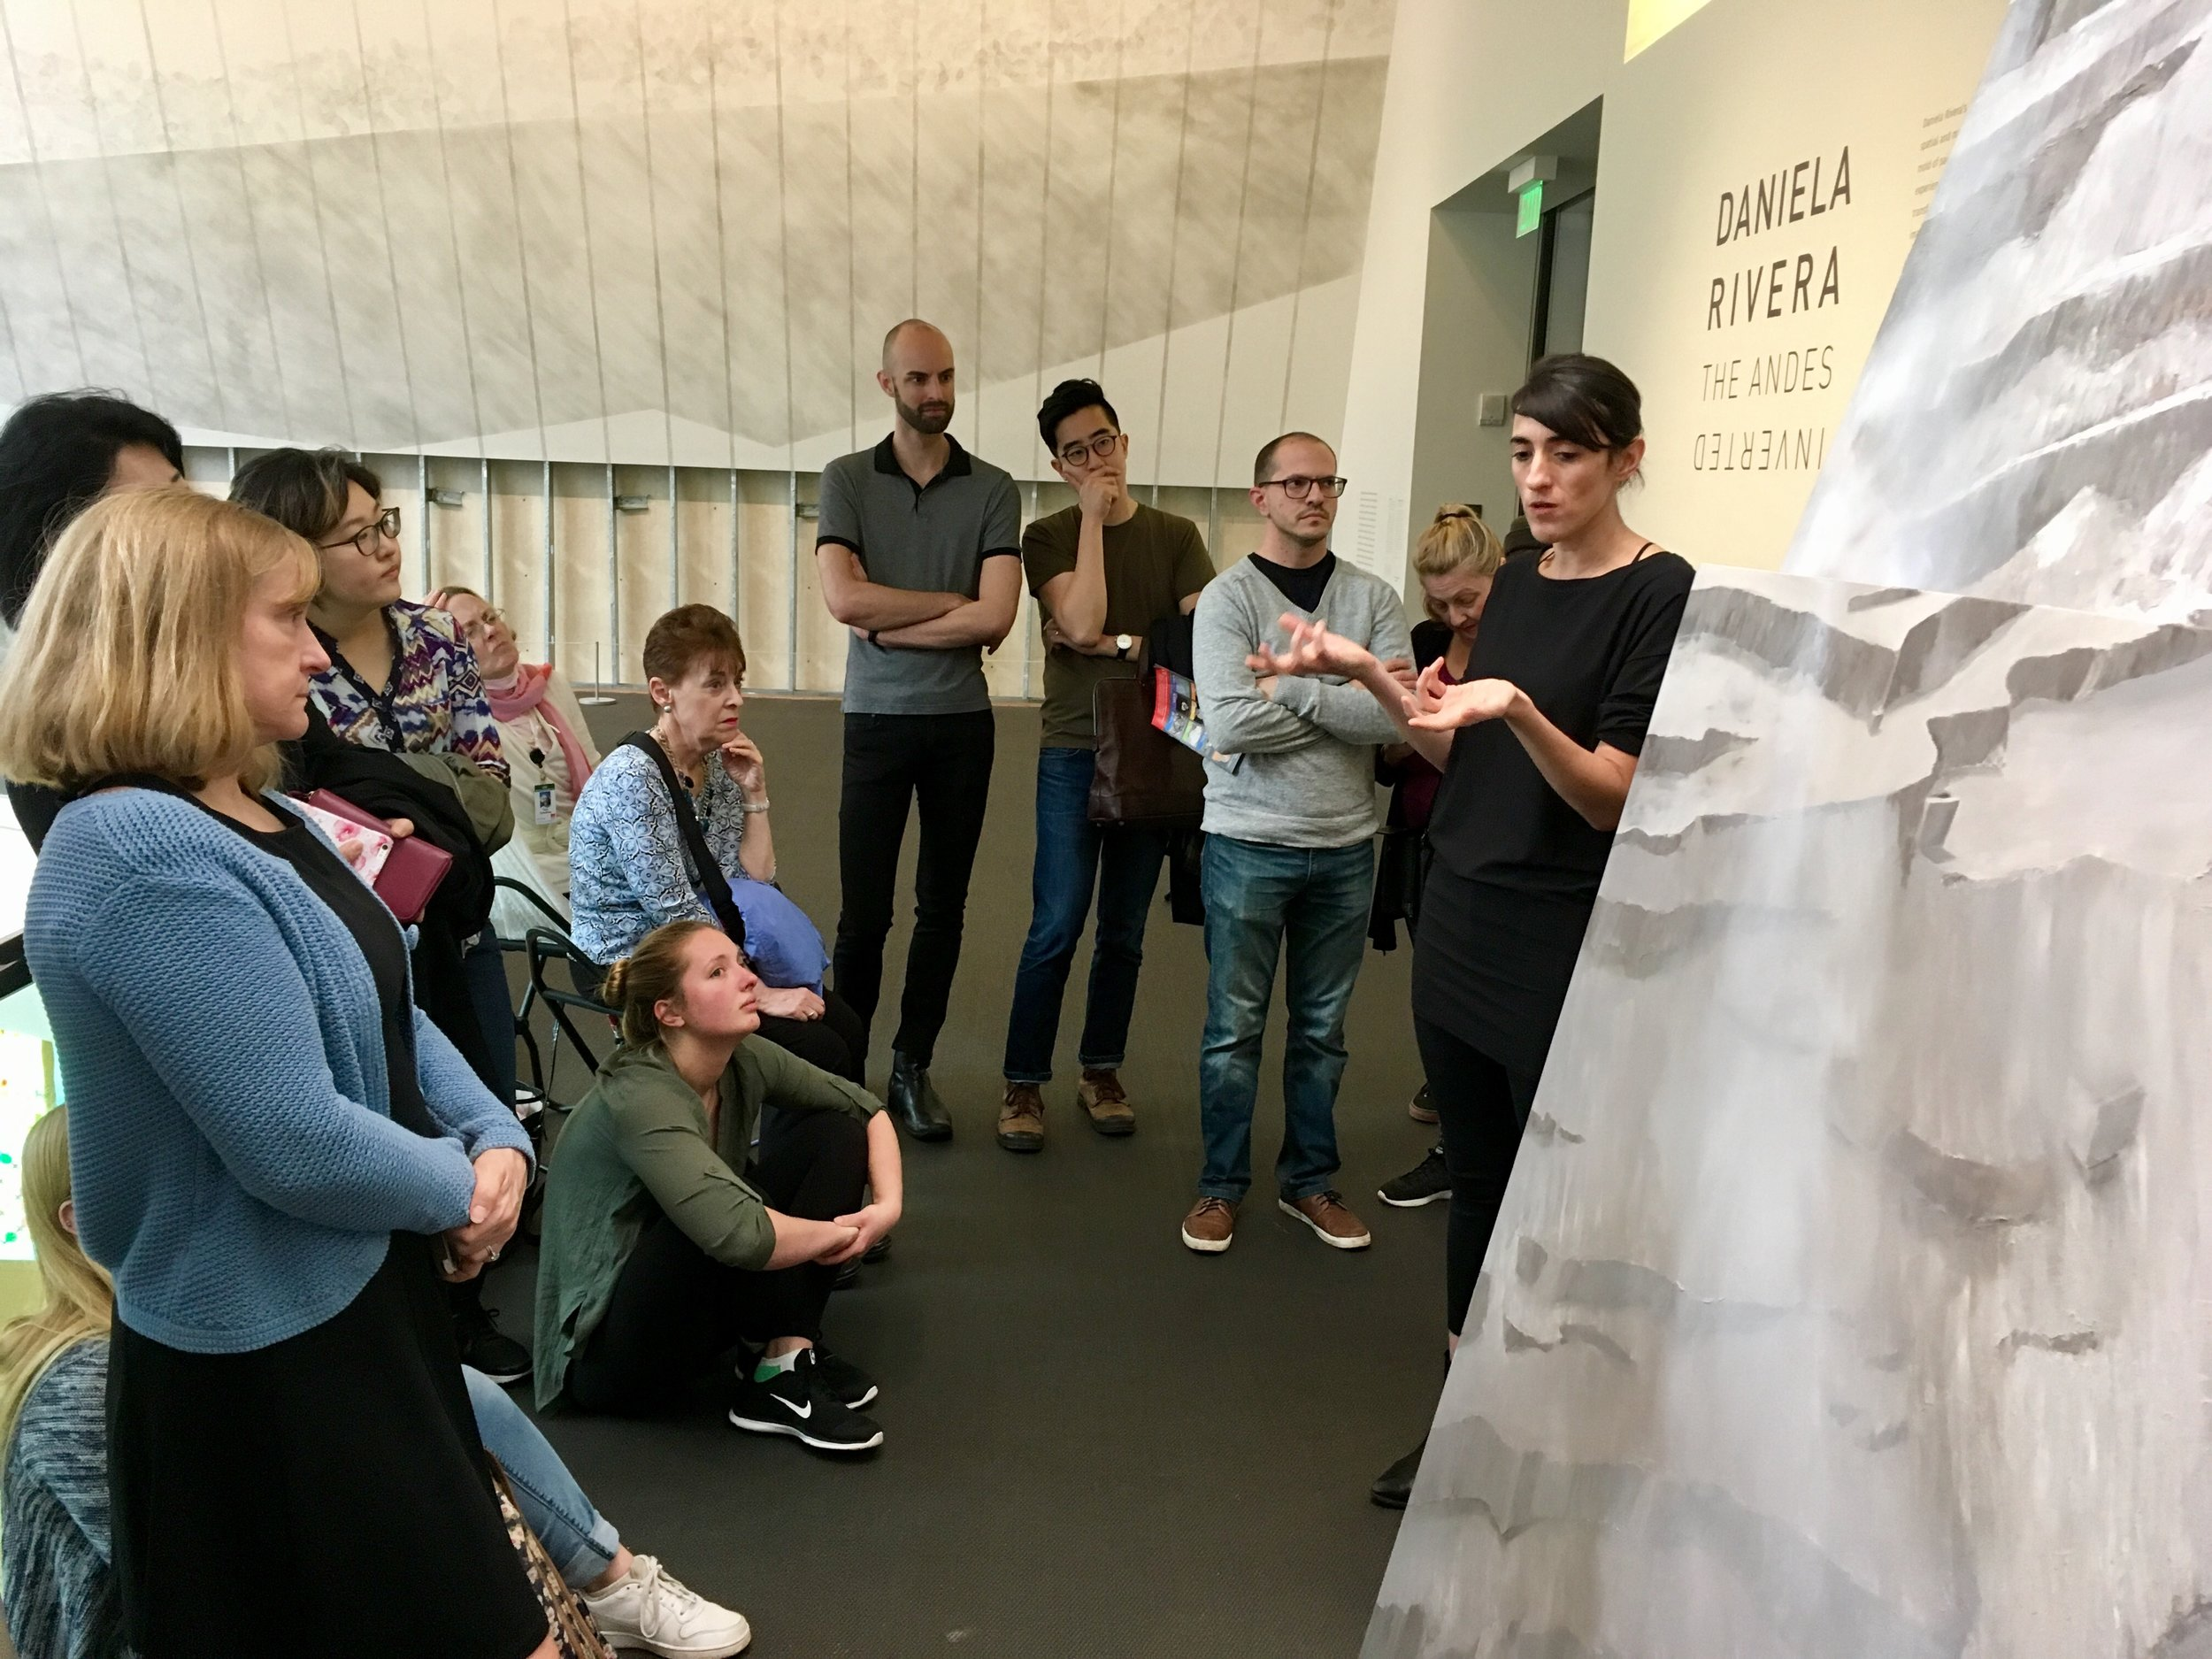 Daniela Rivera in our joint gallery talk for the public, Museum of Fine Arts, Boston 2017